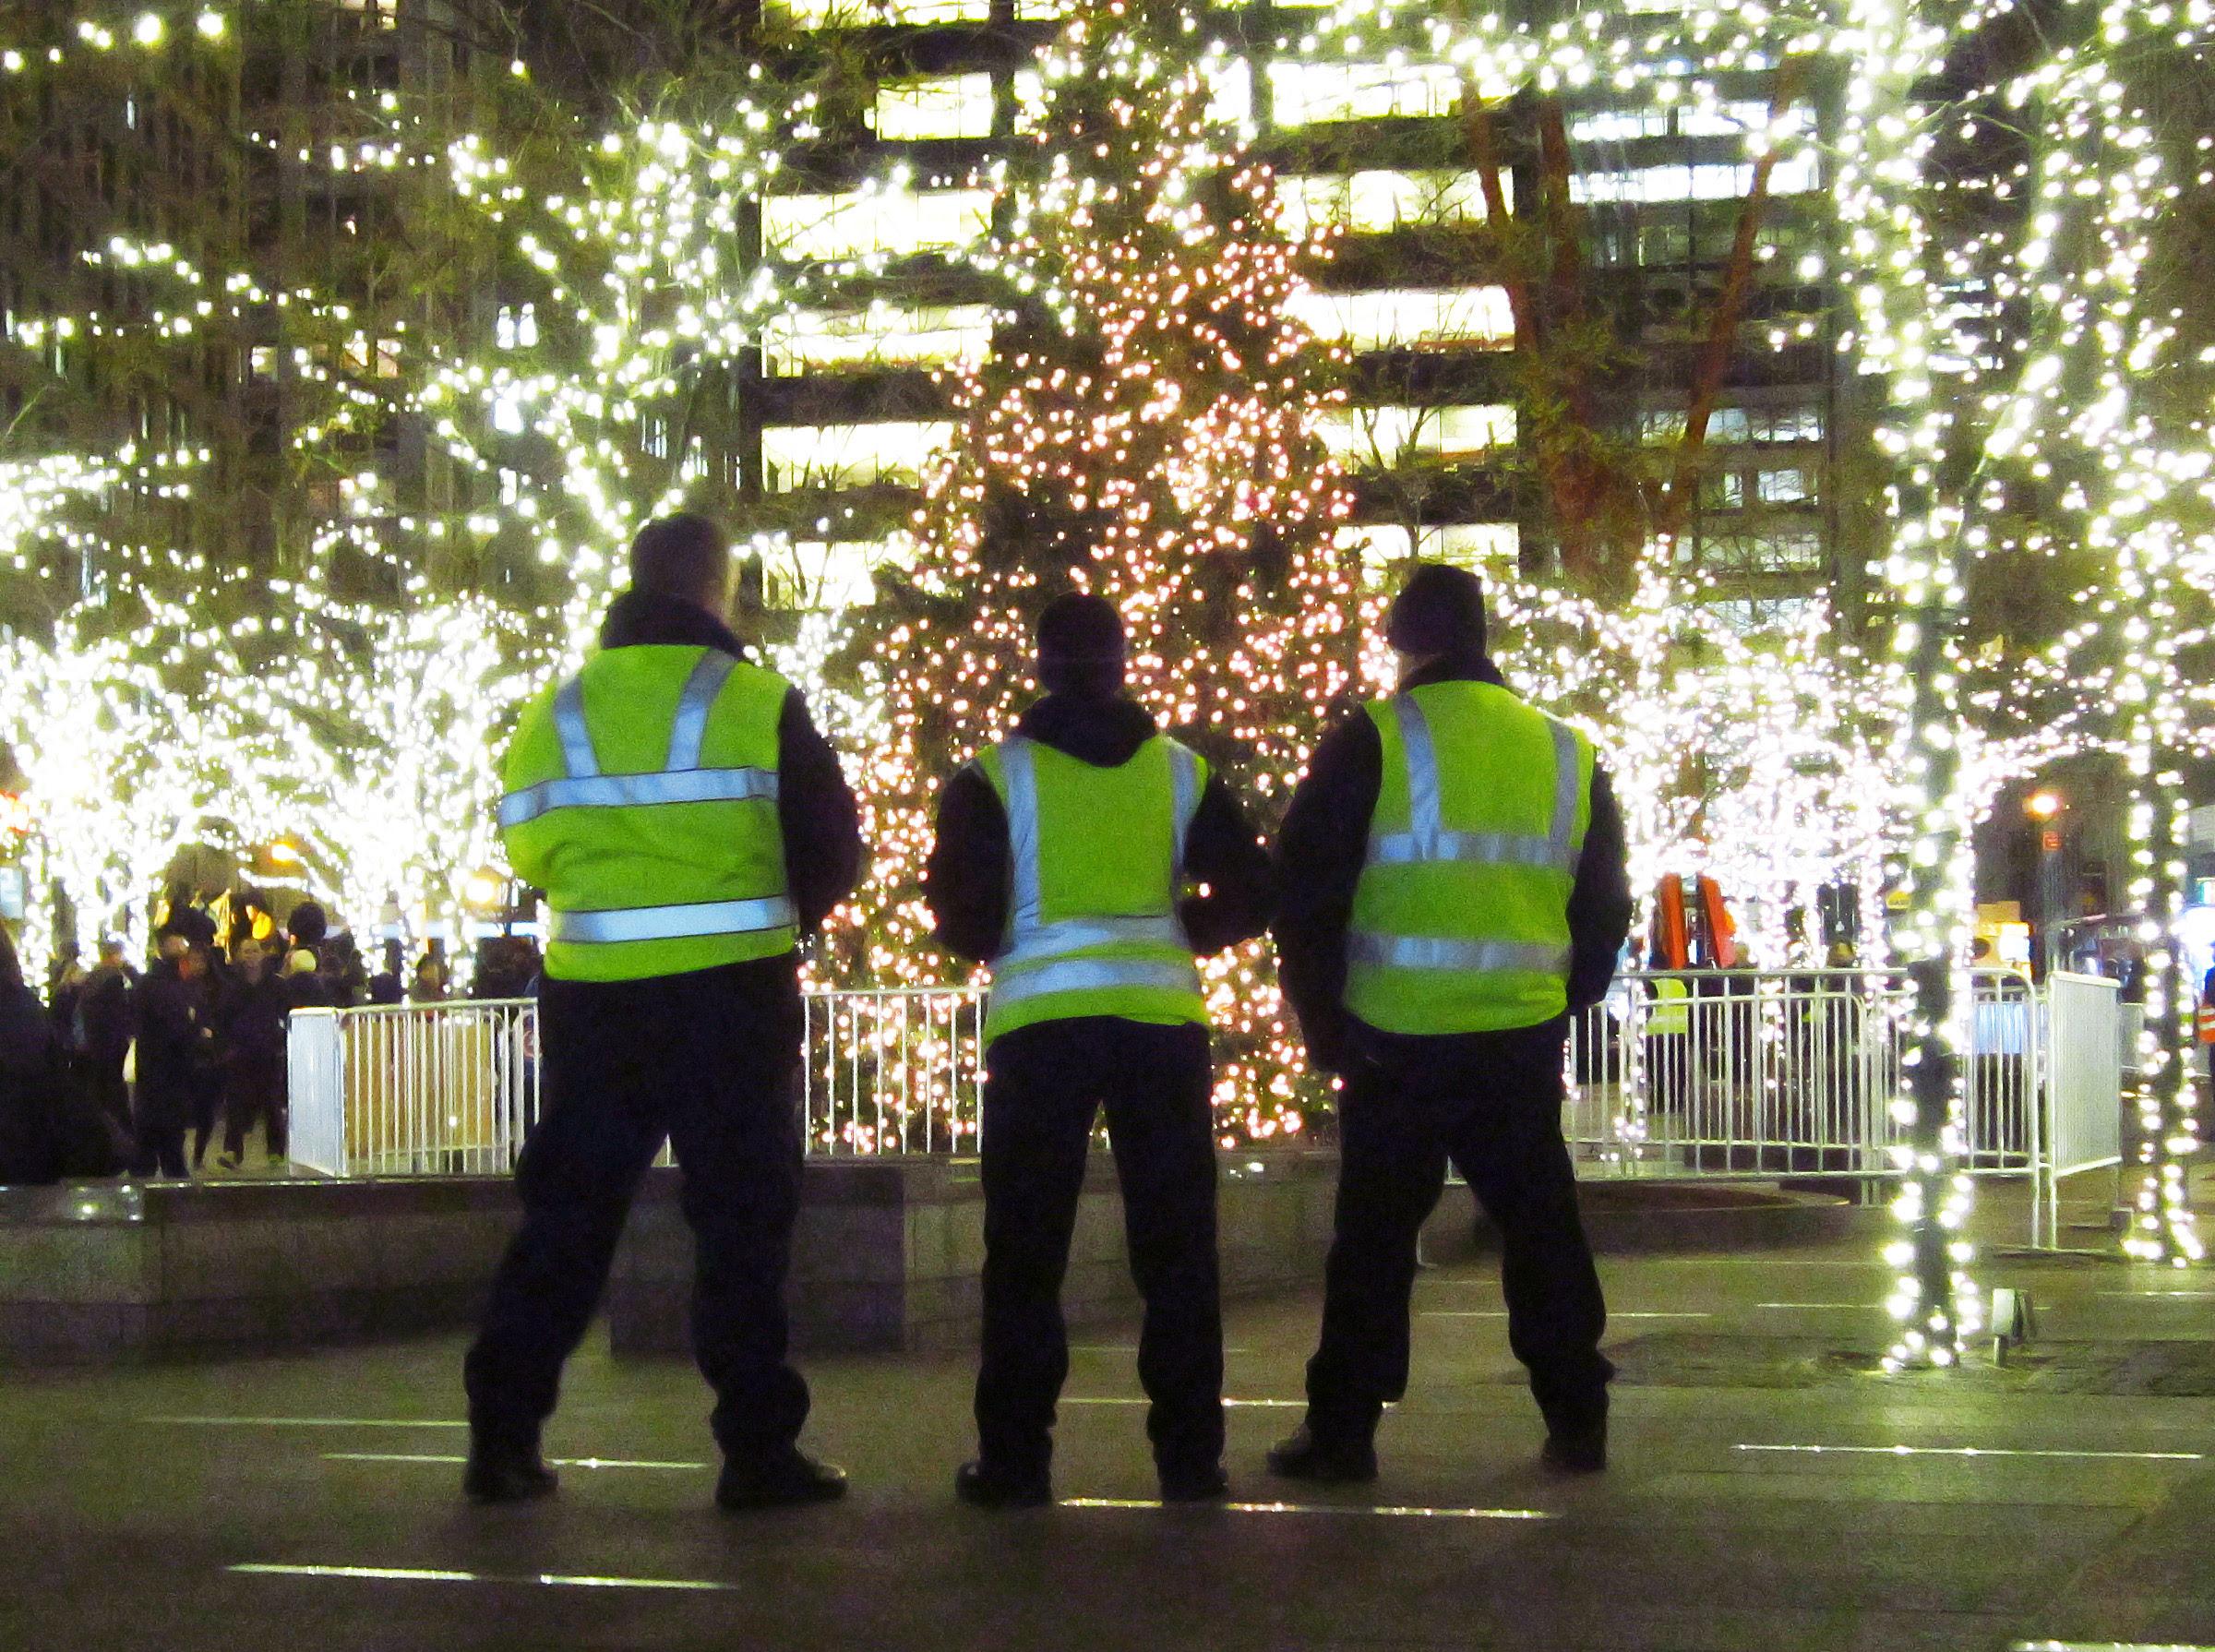 Guarding the Christmas tree